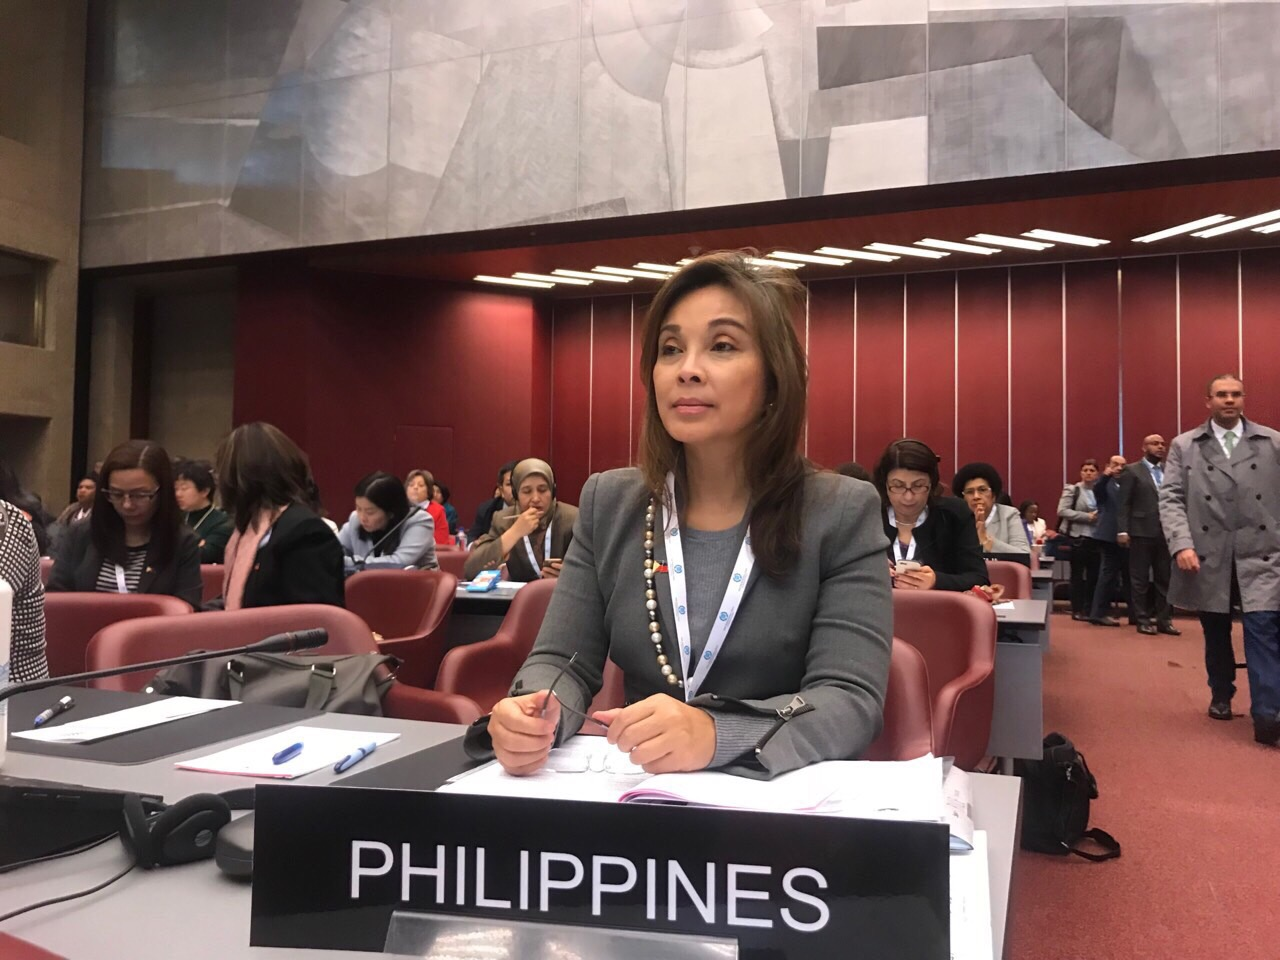 Legarda at the 138th Assembly of the Inter-Parliamentary Union (IPU) in Geneva, Switzerland